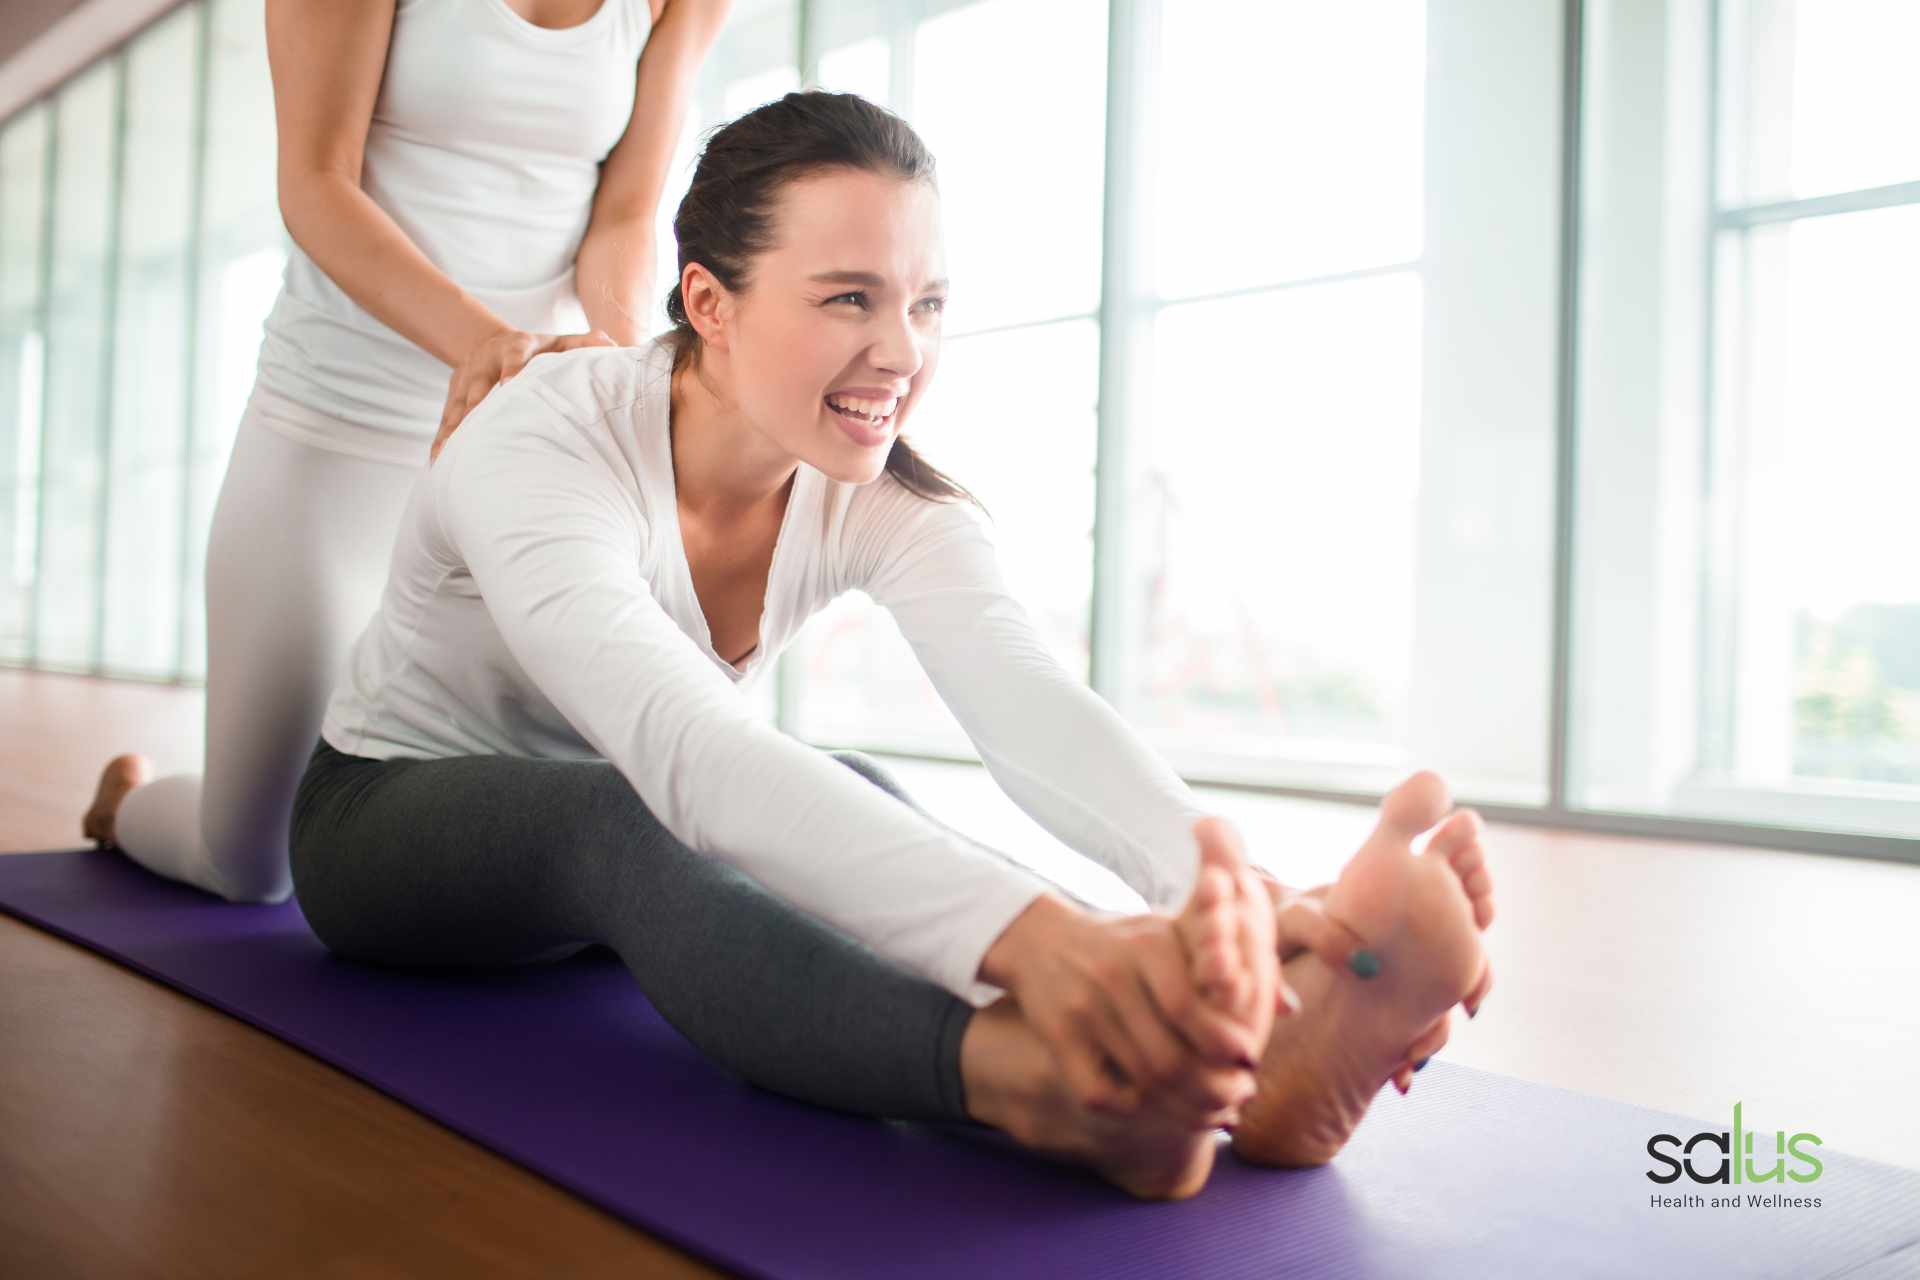 Salus Blog - ginnastica posturale